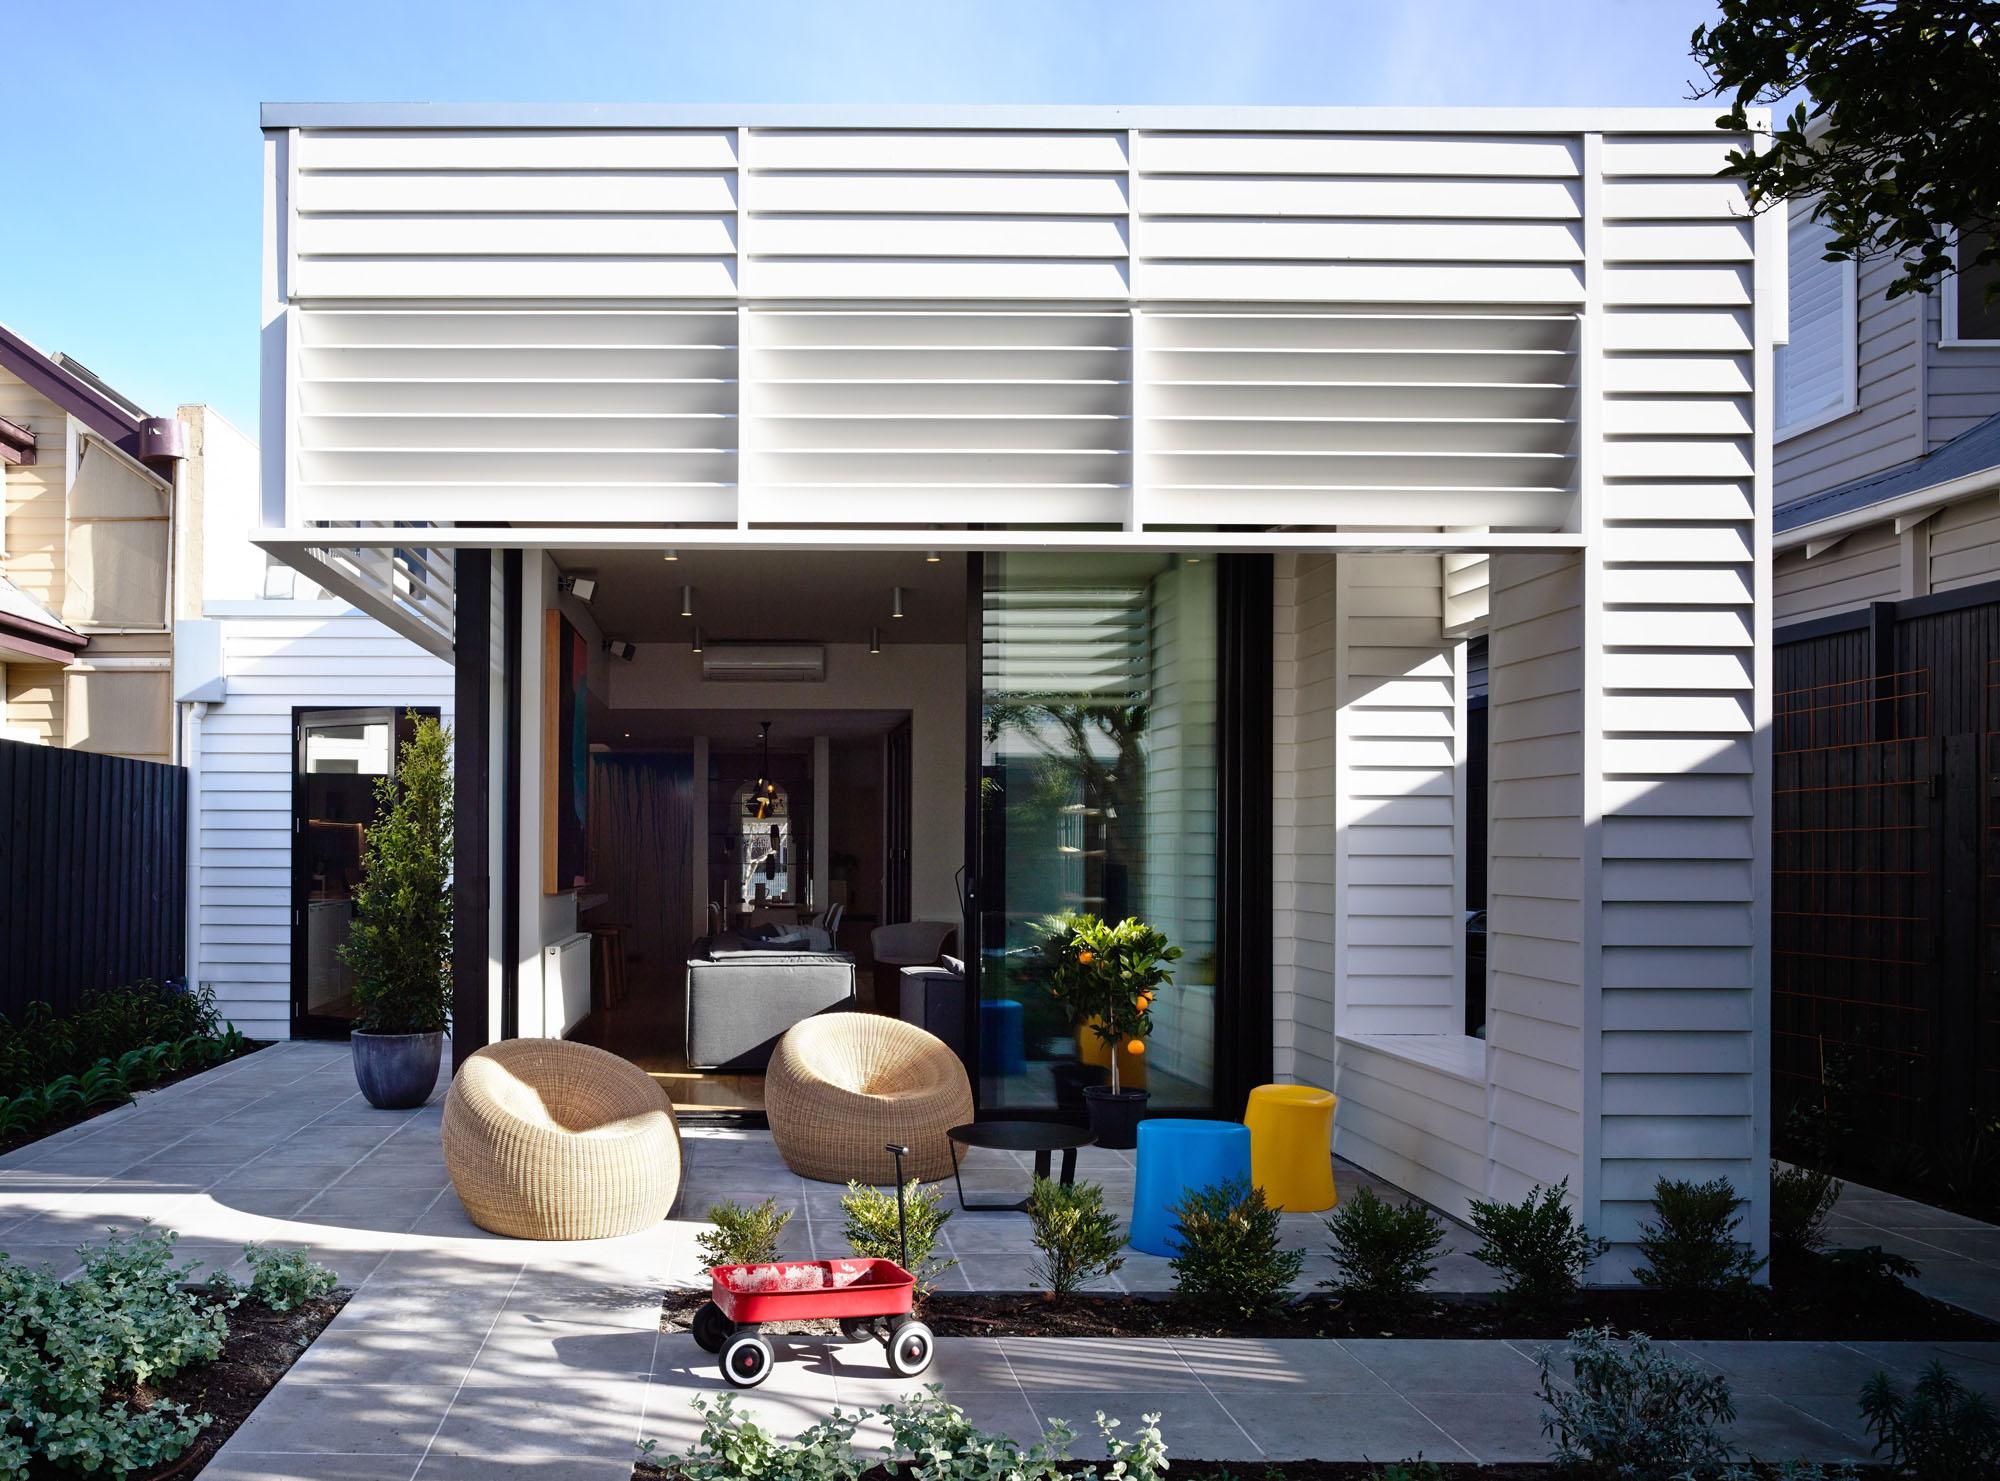 Casa de campo reconstruida como un hogar divertido y moderno 4